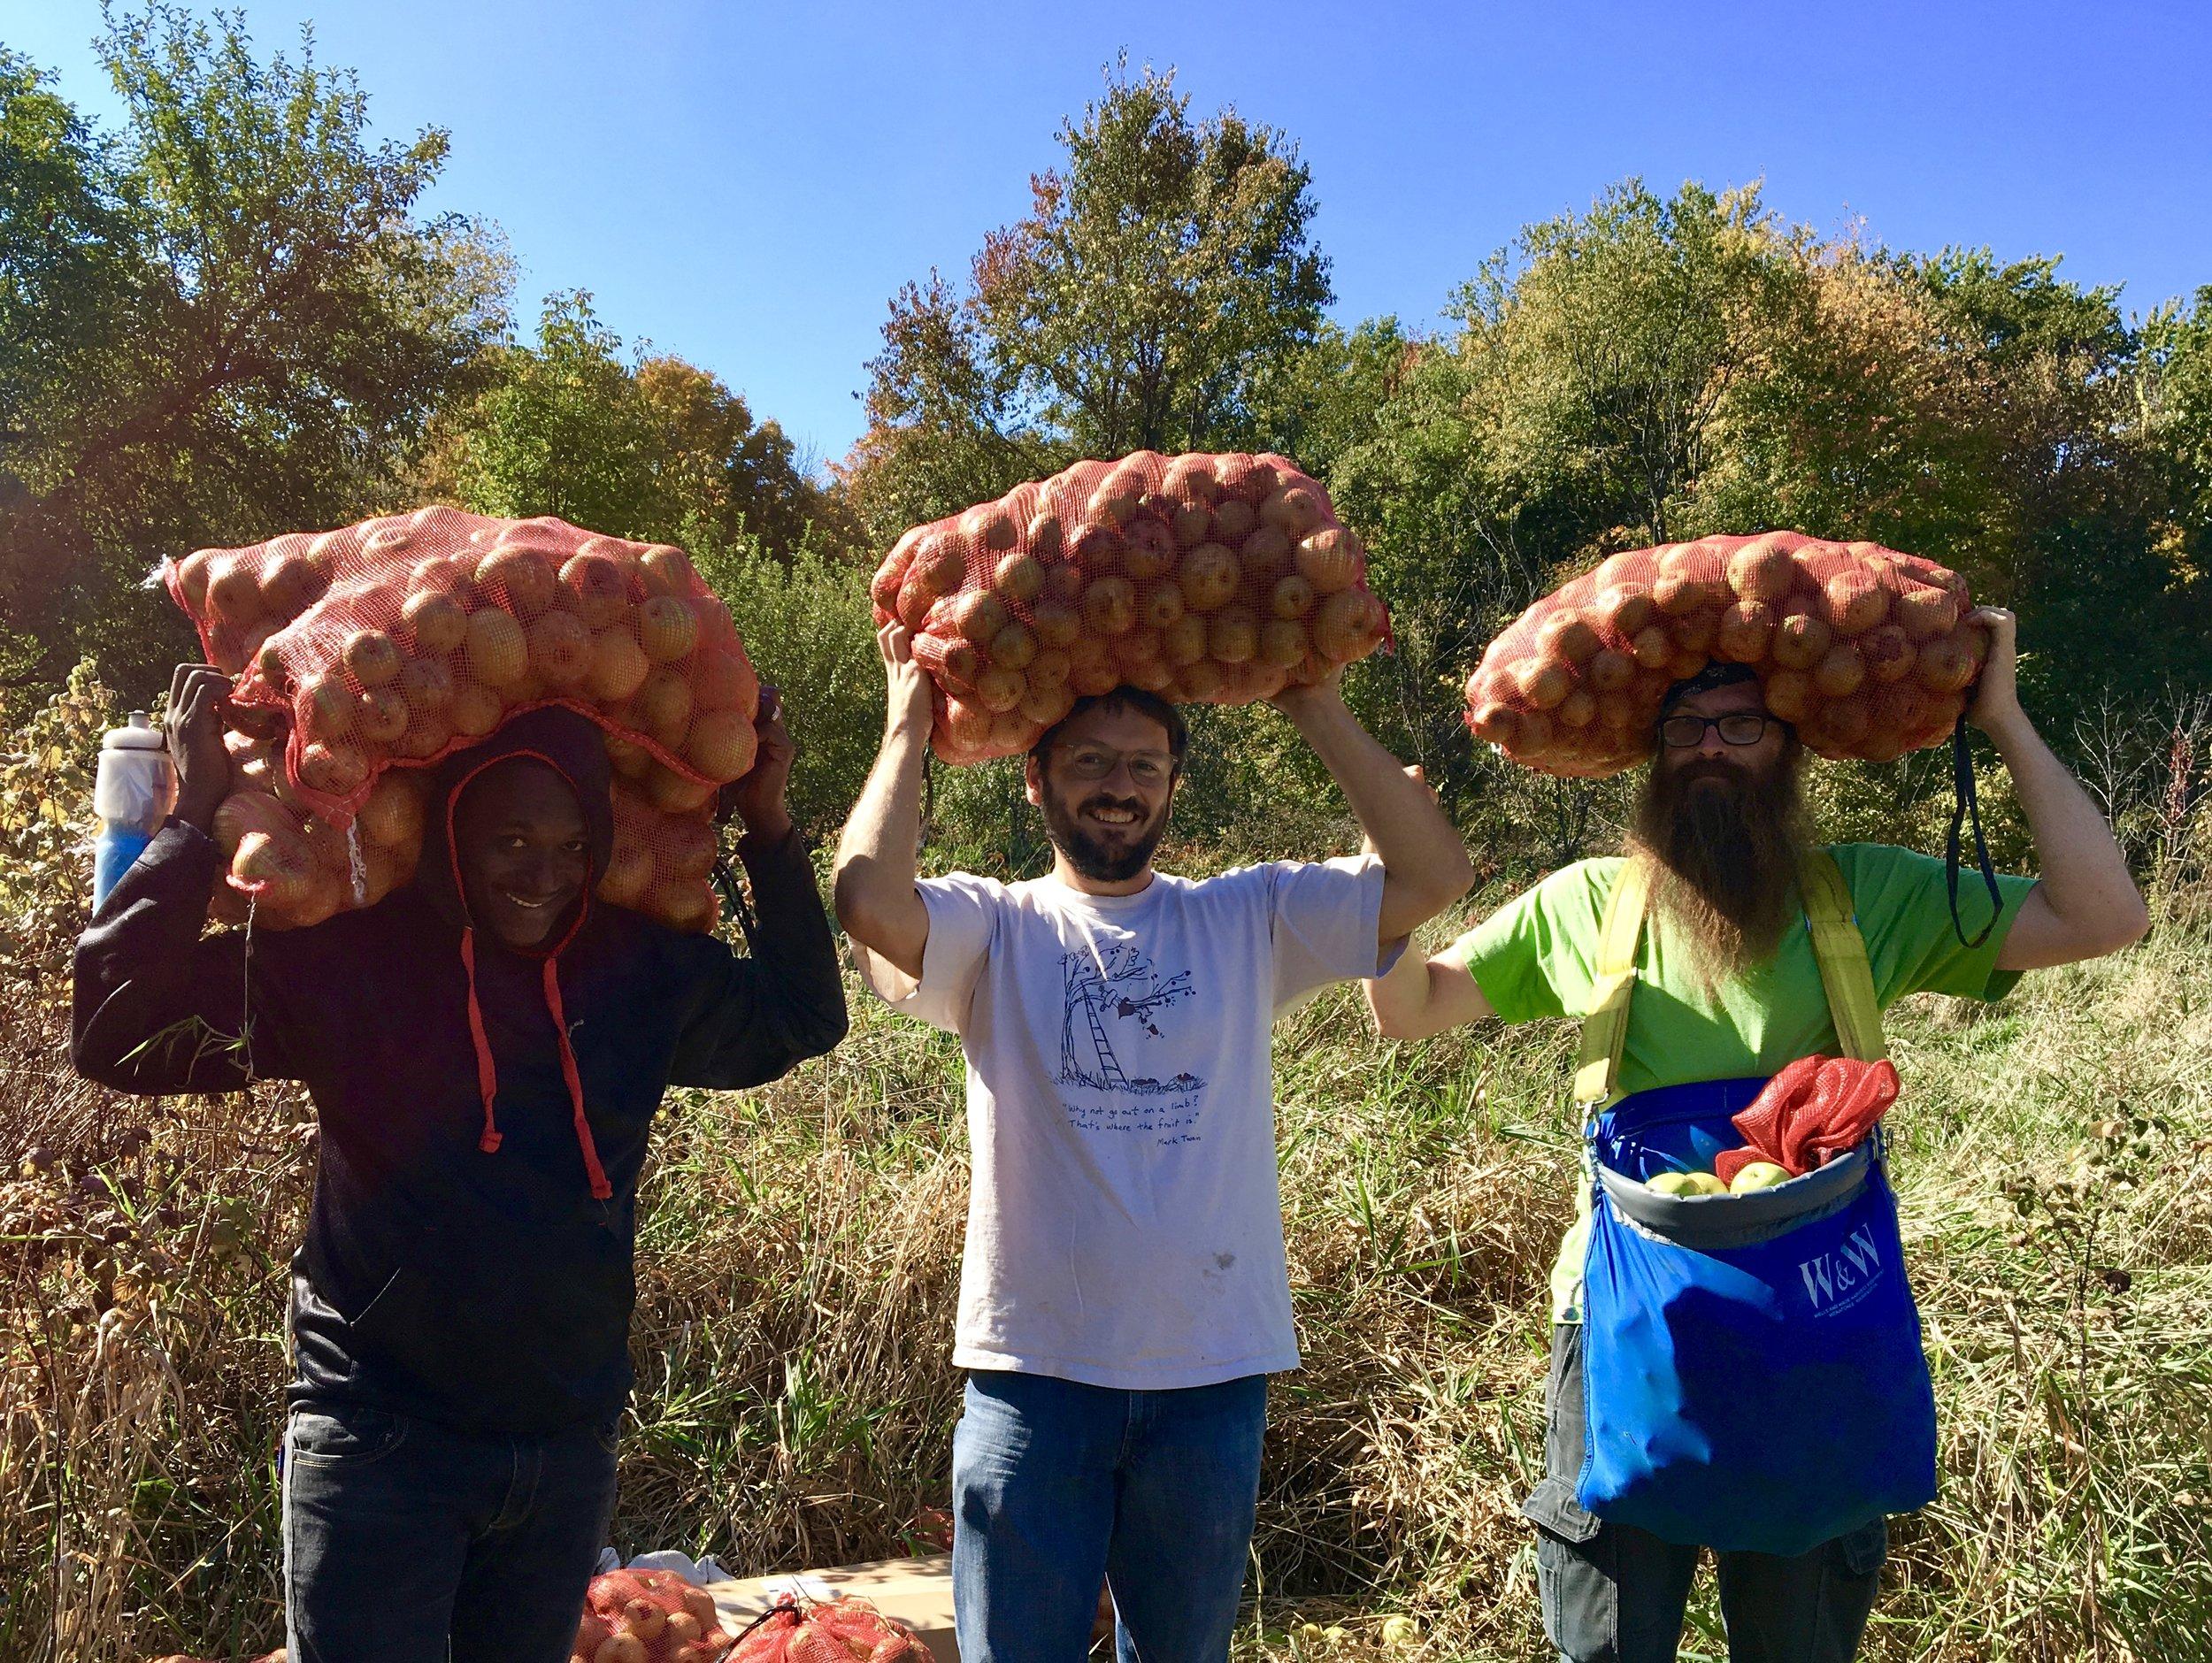 Above:  Osieda, Matt, and Bergere hauling apples on their heads